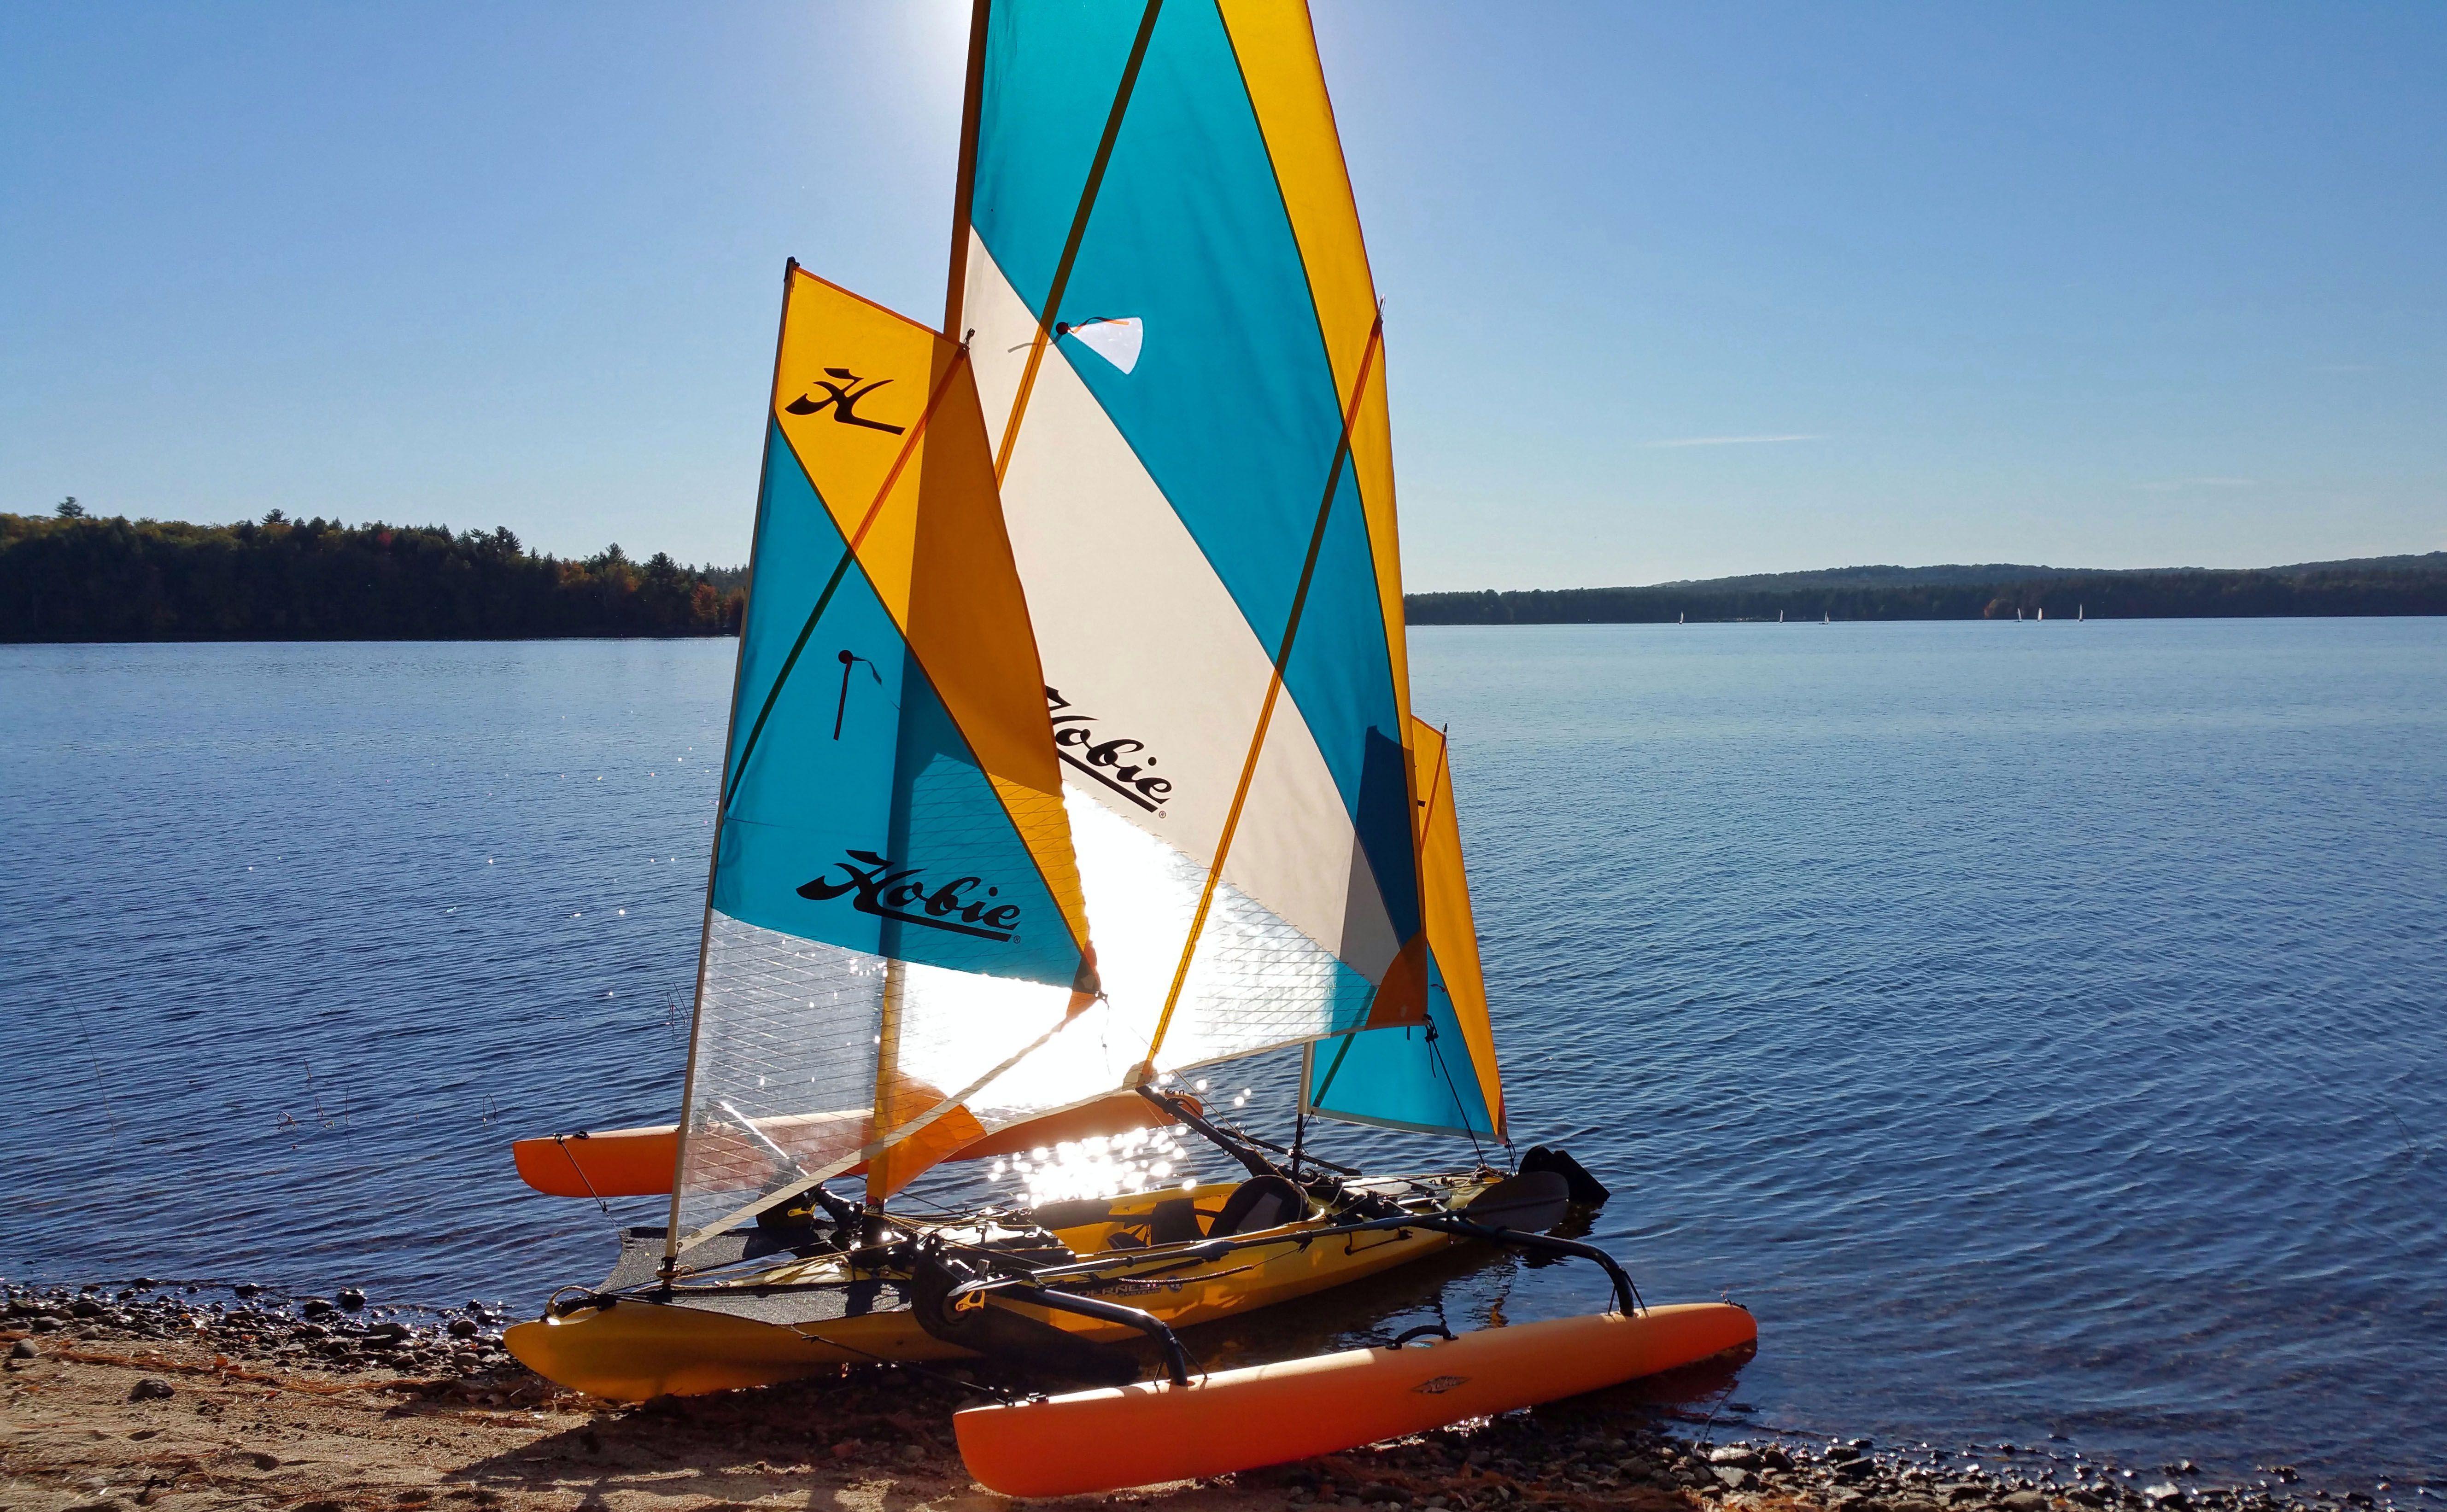 Tri sail setup Hobie kayak, Boat, Boat trips